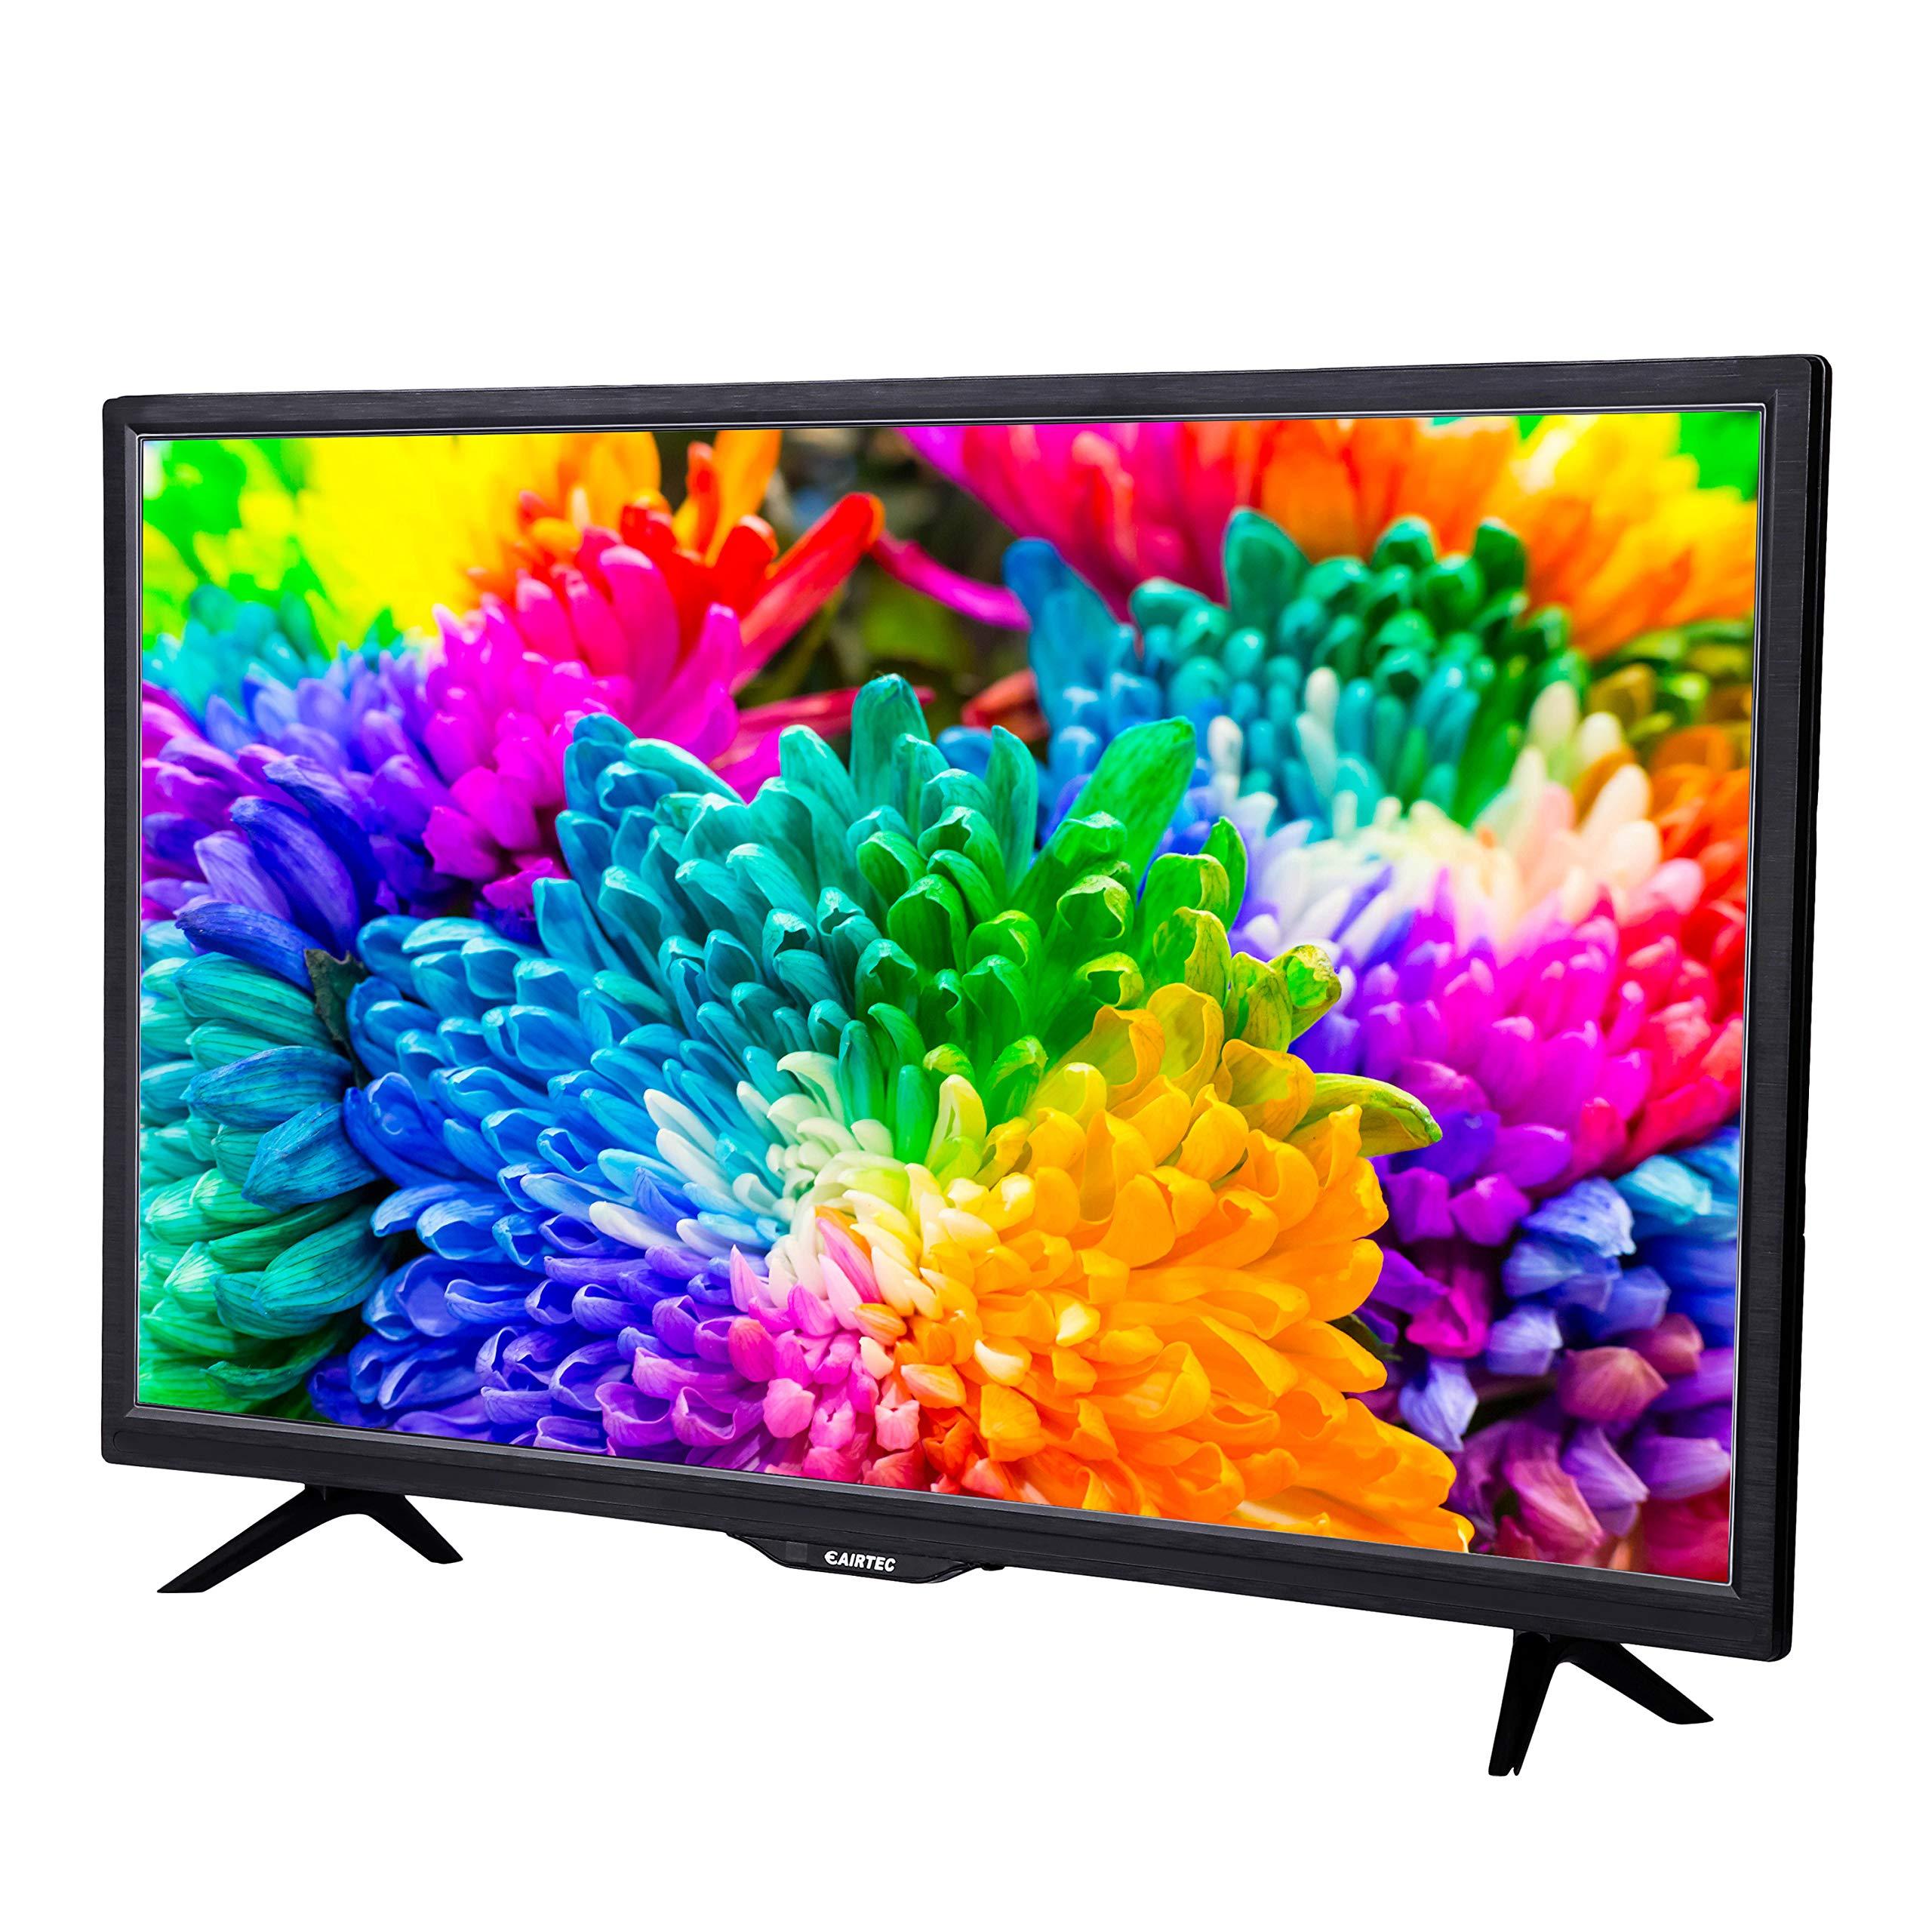 eAirtec 81 cm (32 inches) HD Ready LED TV 32DJ (Black)